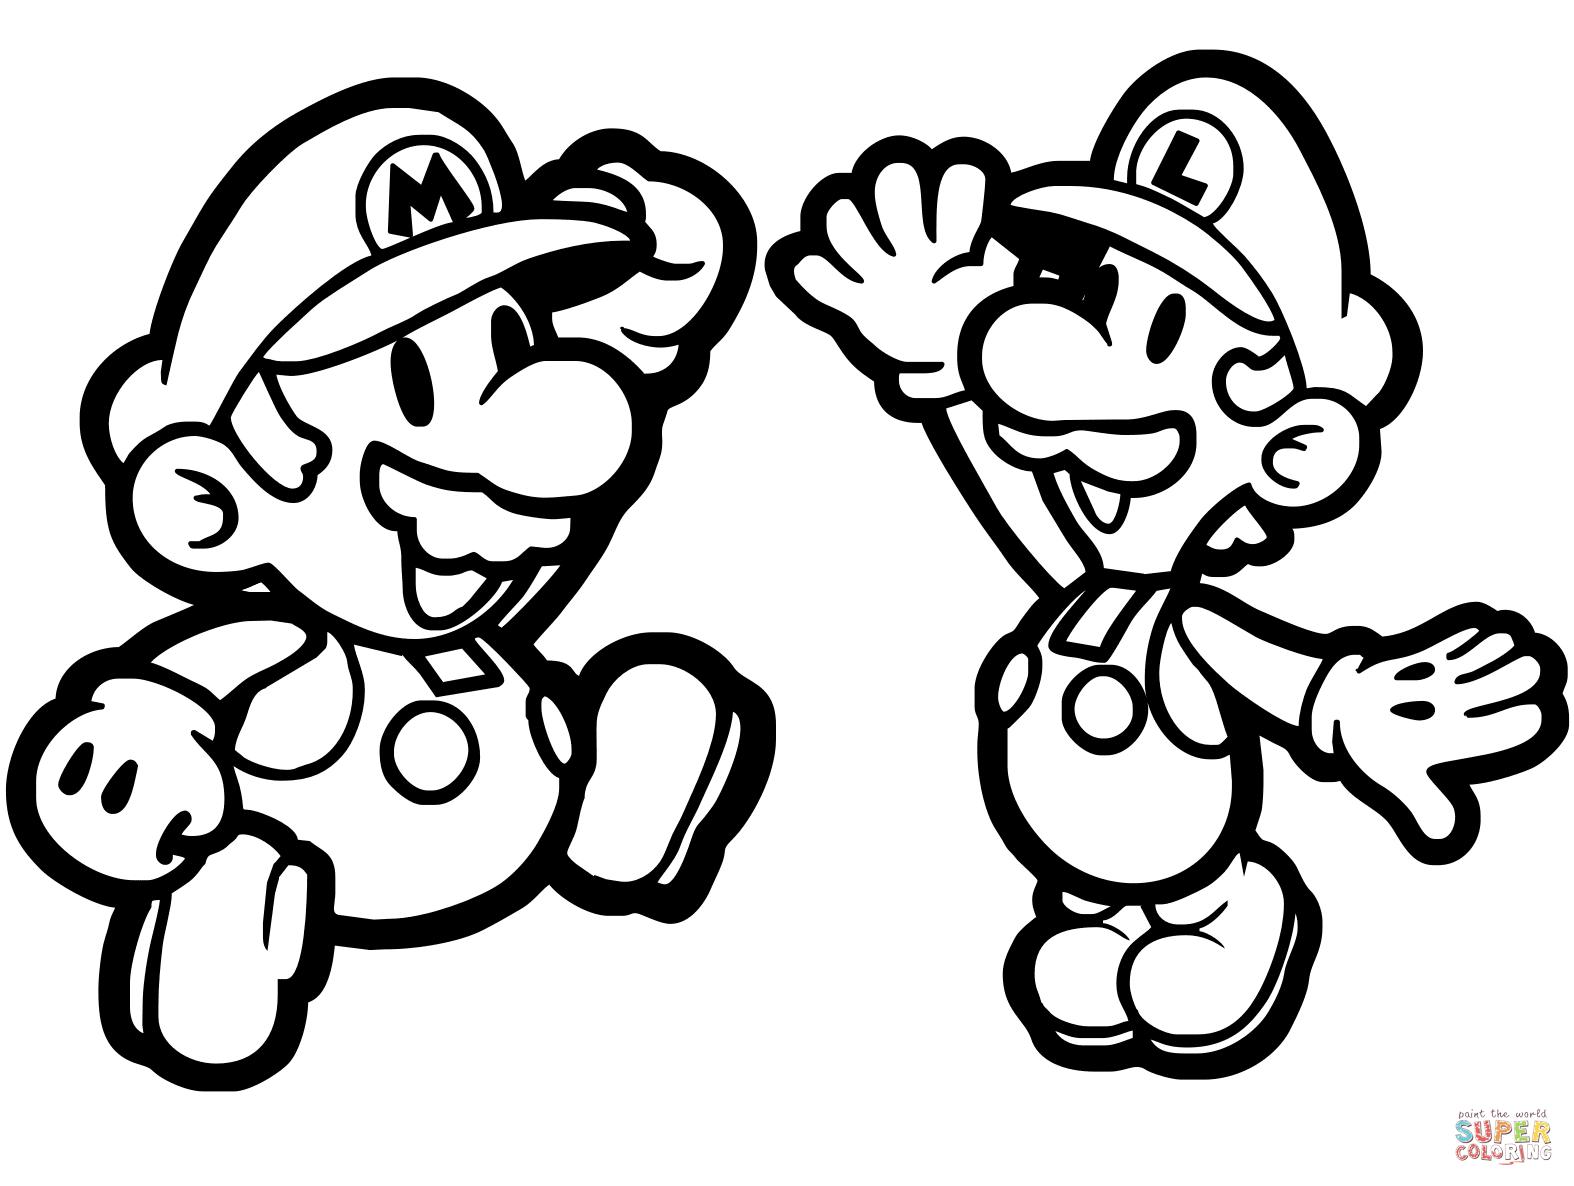 1574x1186 Mario And Luigi Drawing Paper Mario And Luigi Coloring Page Free